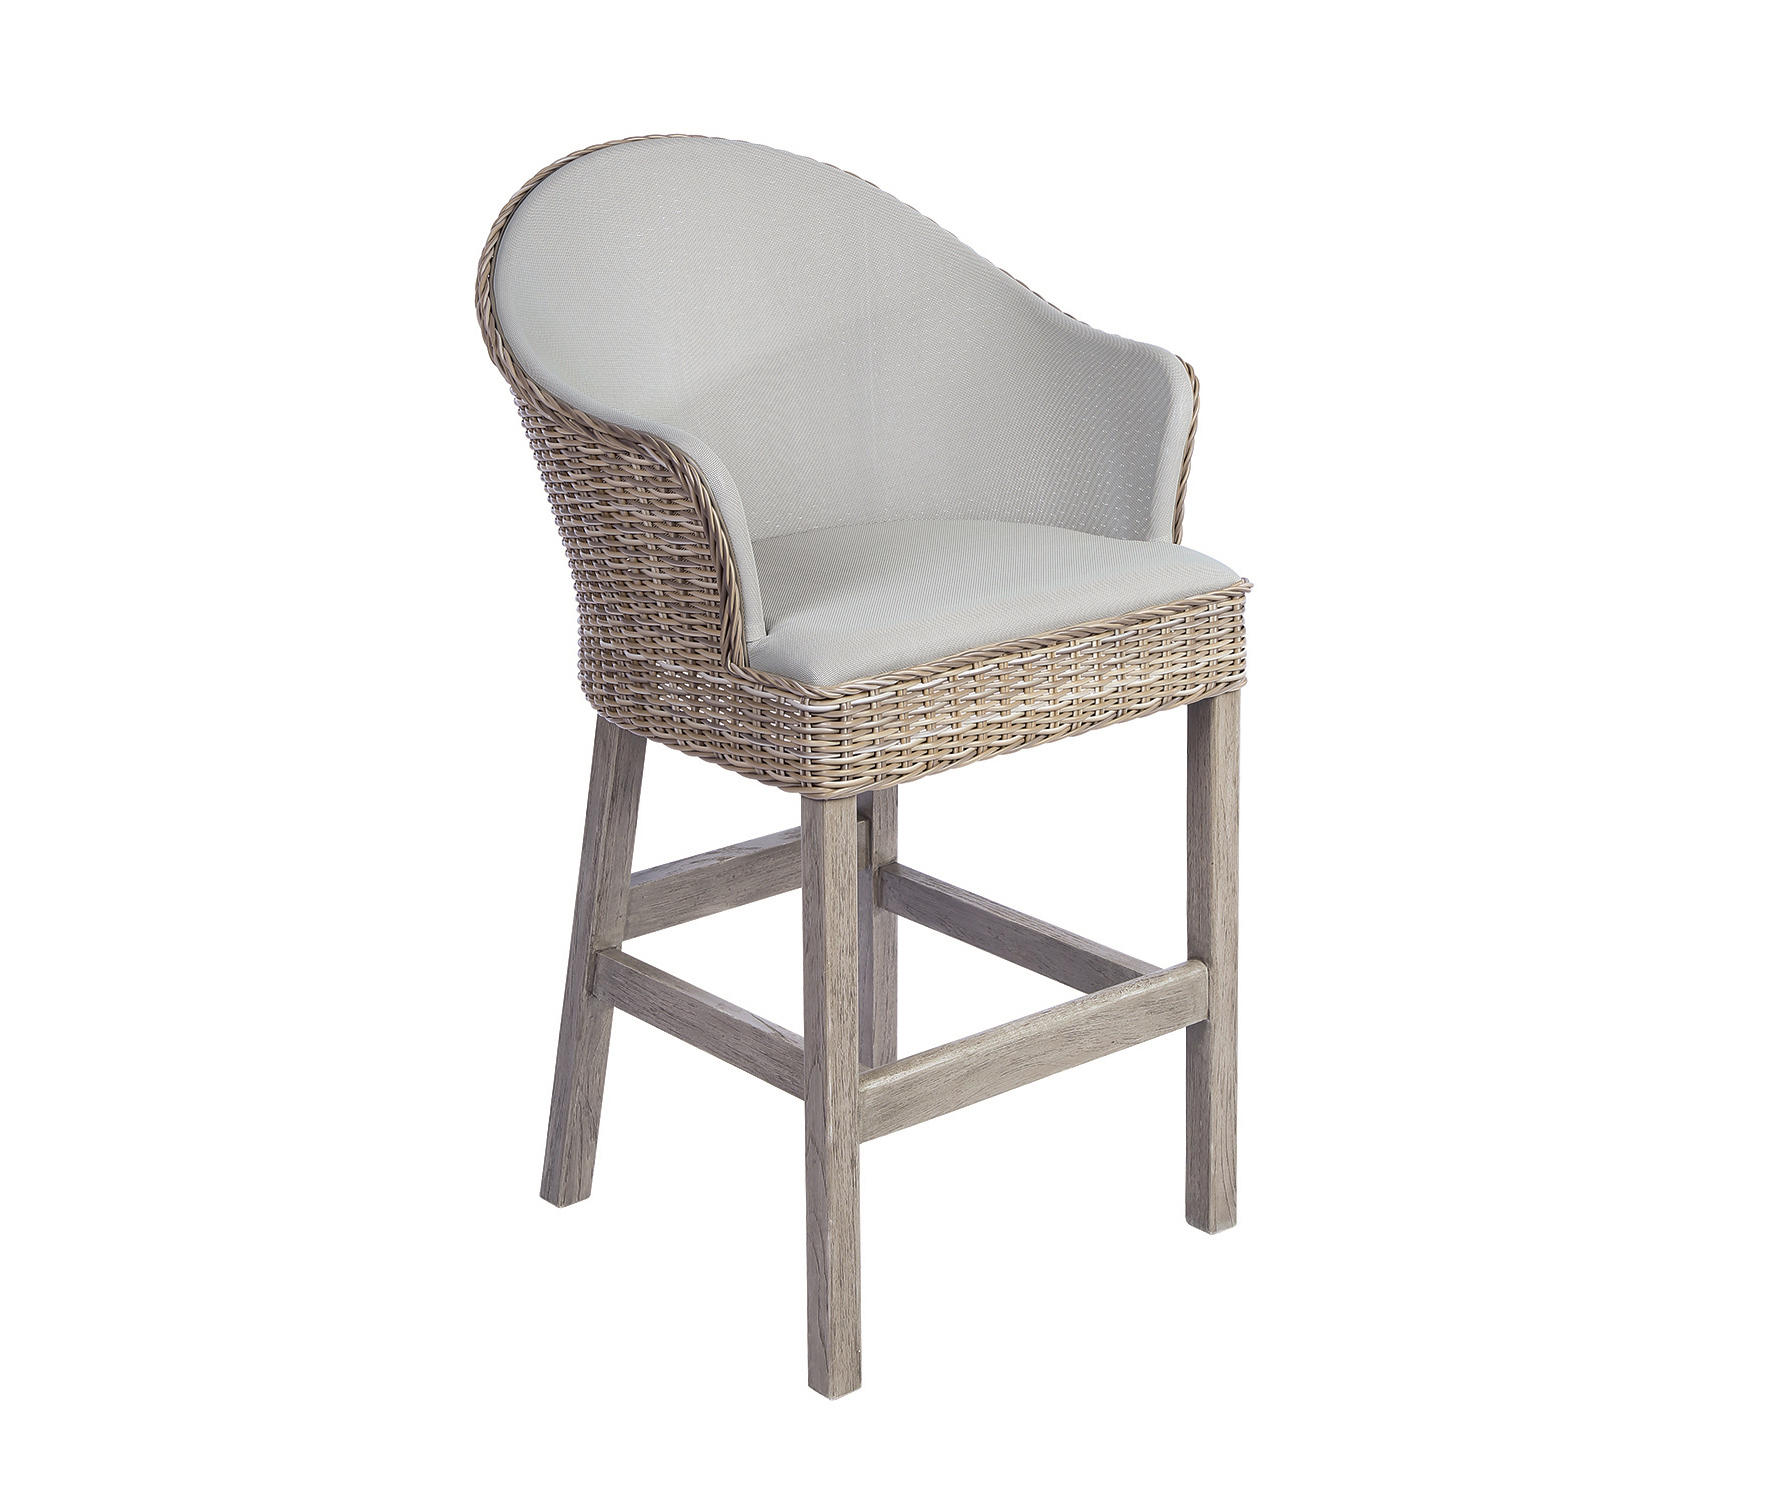 Milano bar chair garten barhocker von kingsley bate for Barhocker garten